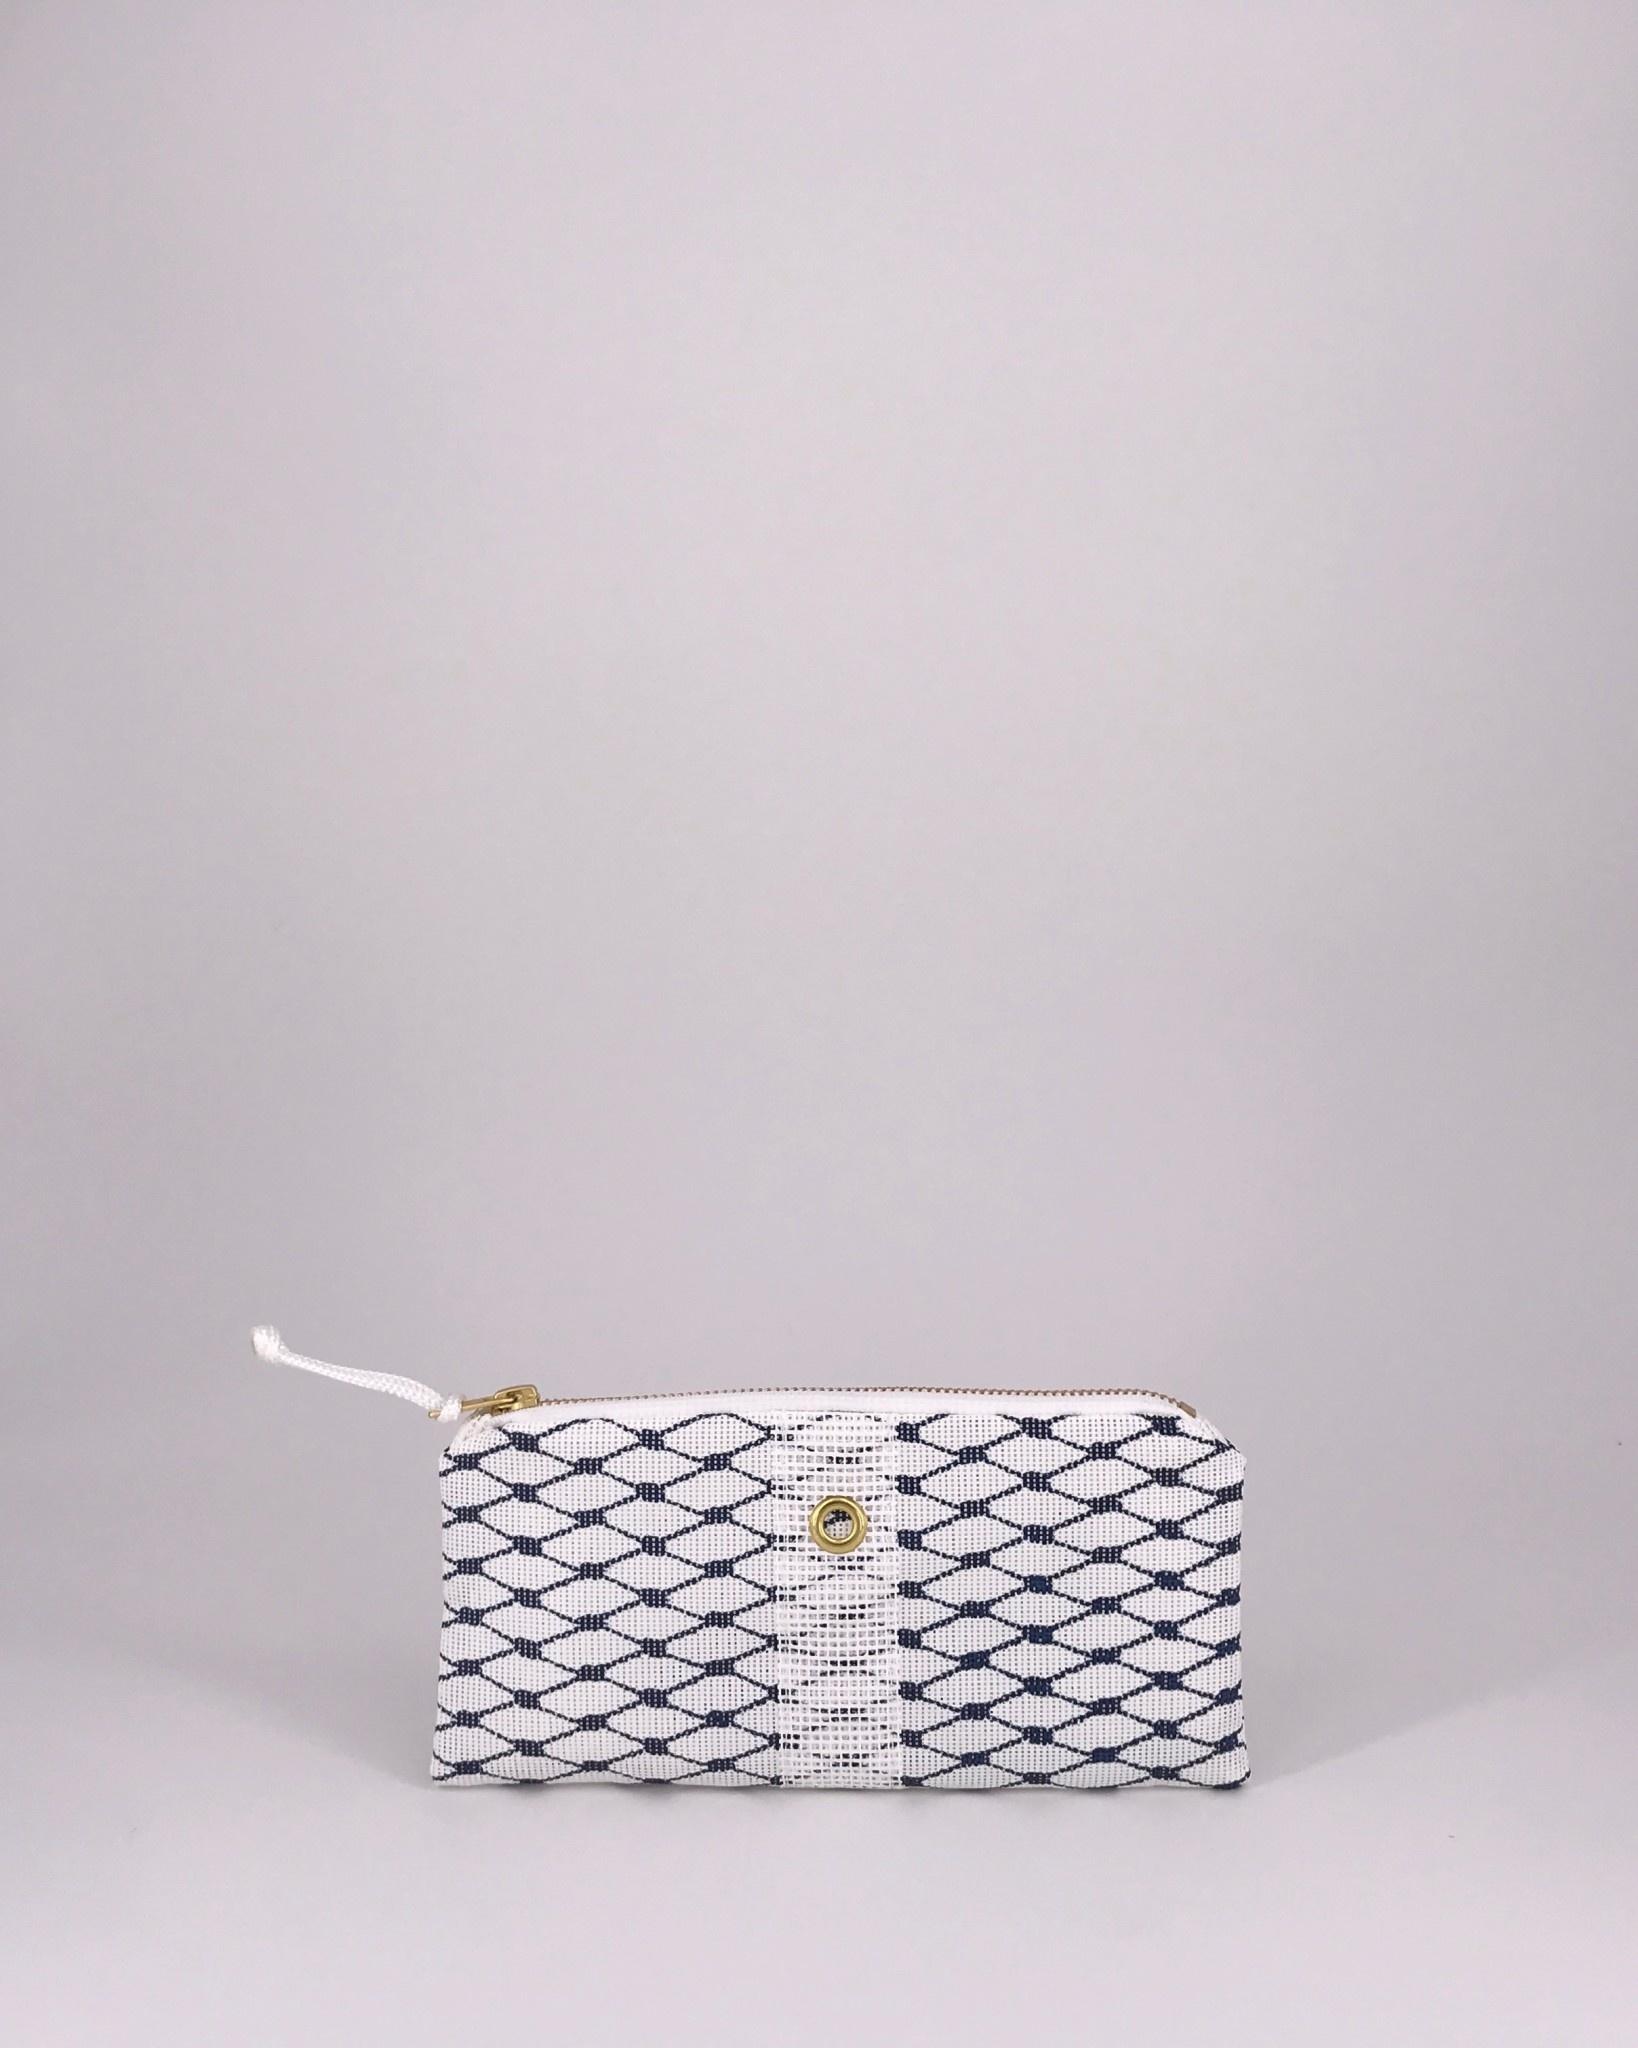 Alaina Marie ® Sailor Blue & White Mini Clutch